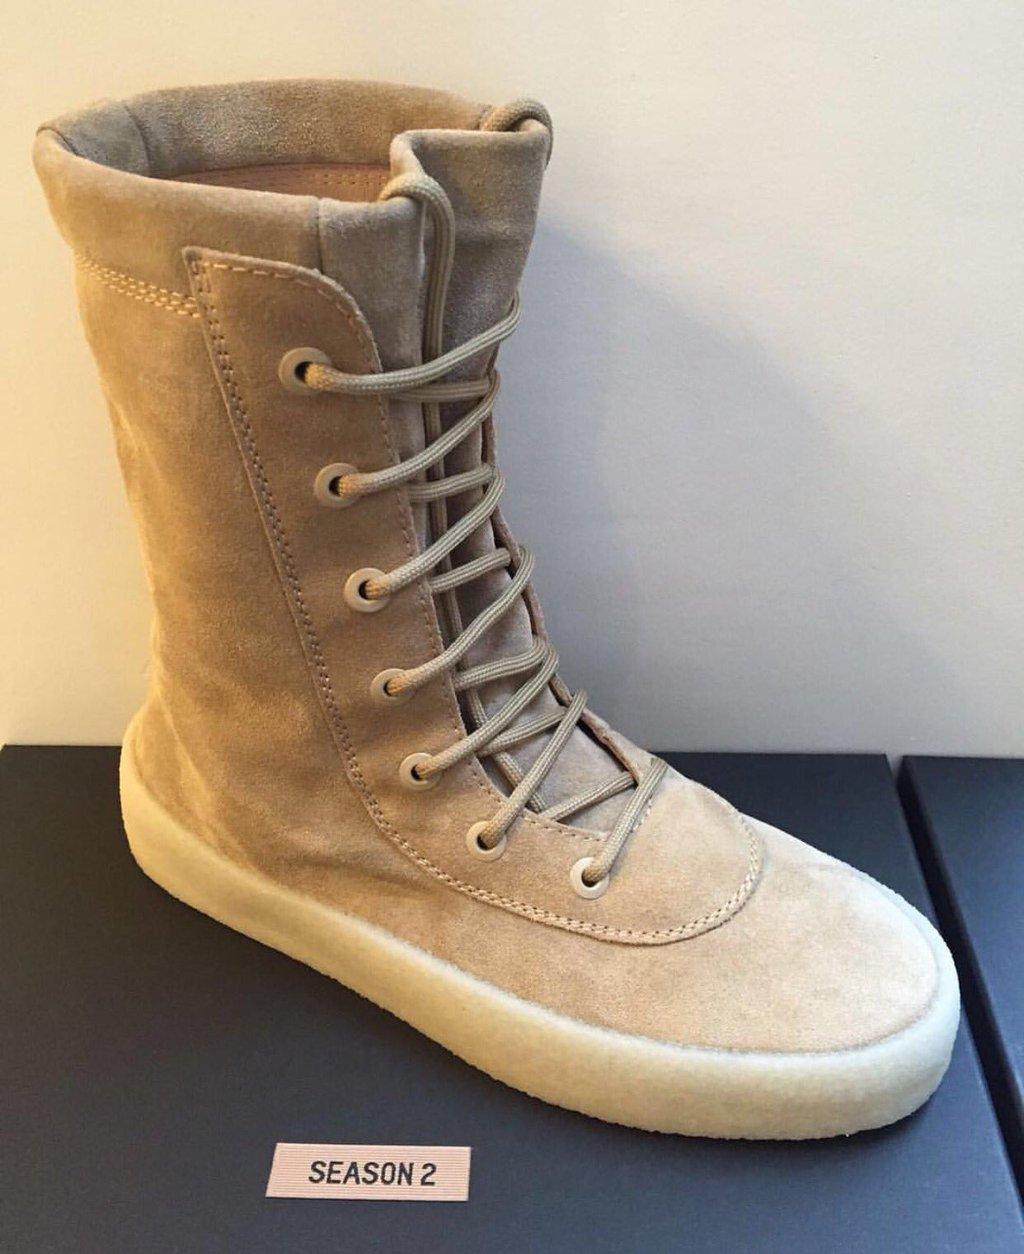 premium selection 700d1 0308c Kanye West Yeezy Season 2 Crepe Boot   Grailed